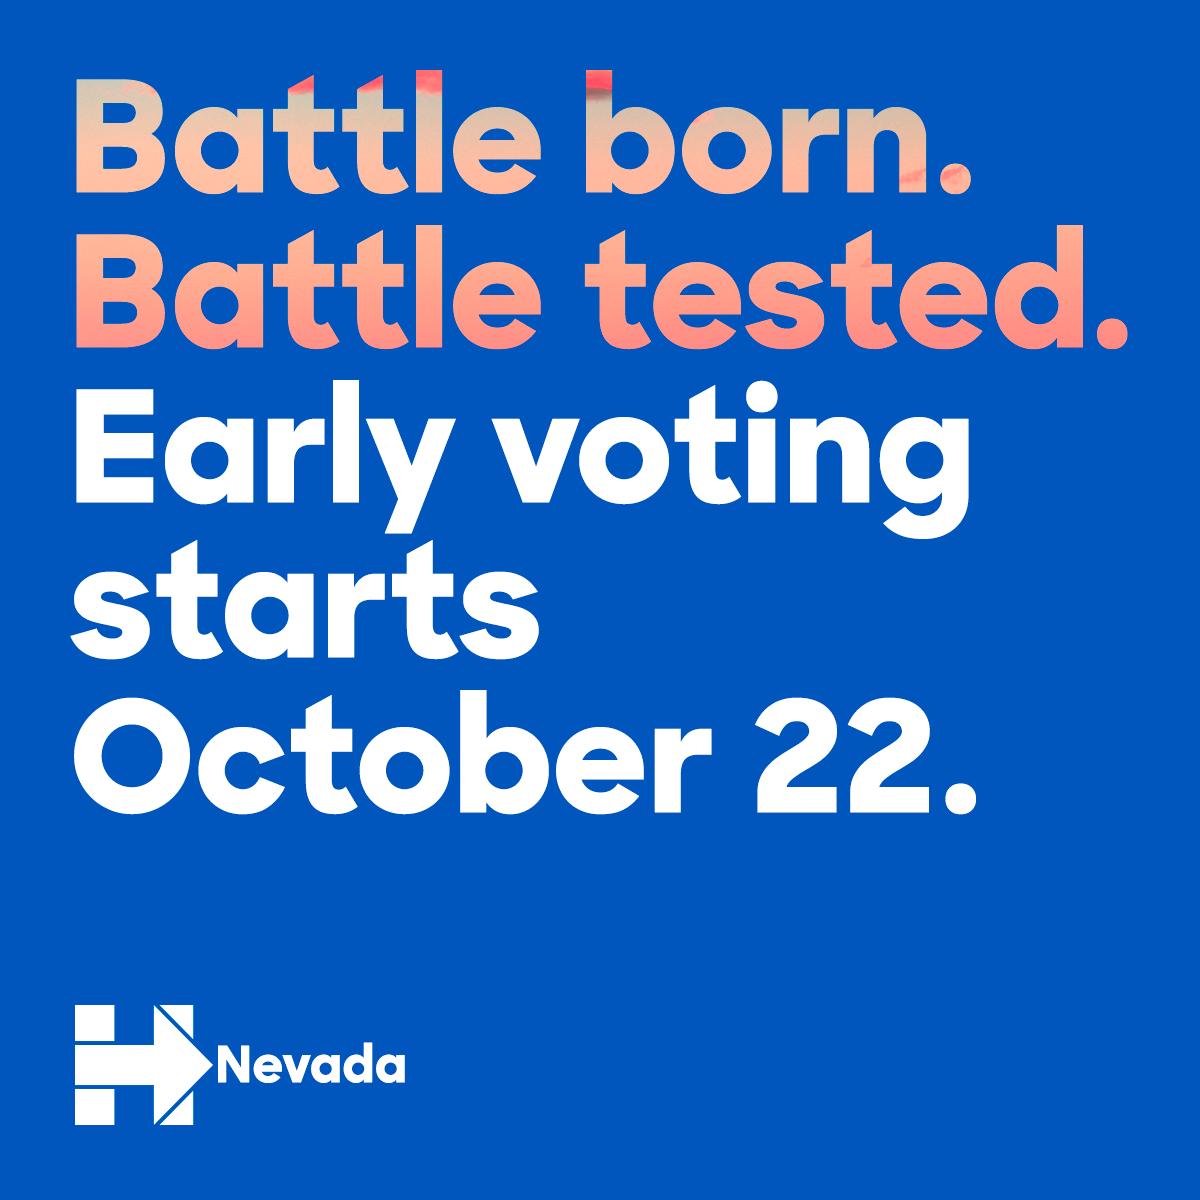 NV-post-debate-vote-early-eng-101016.png